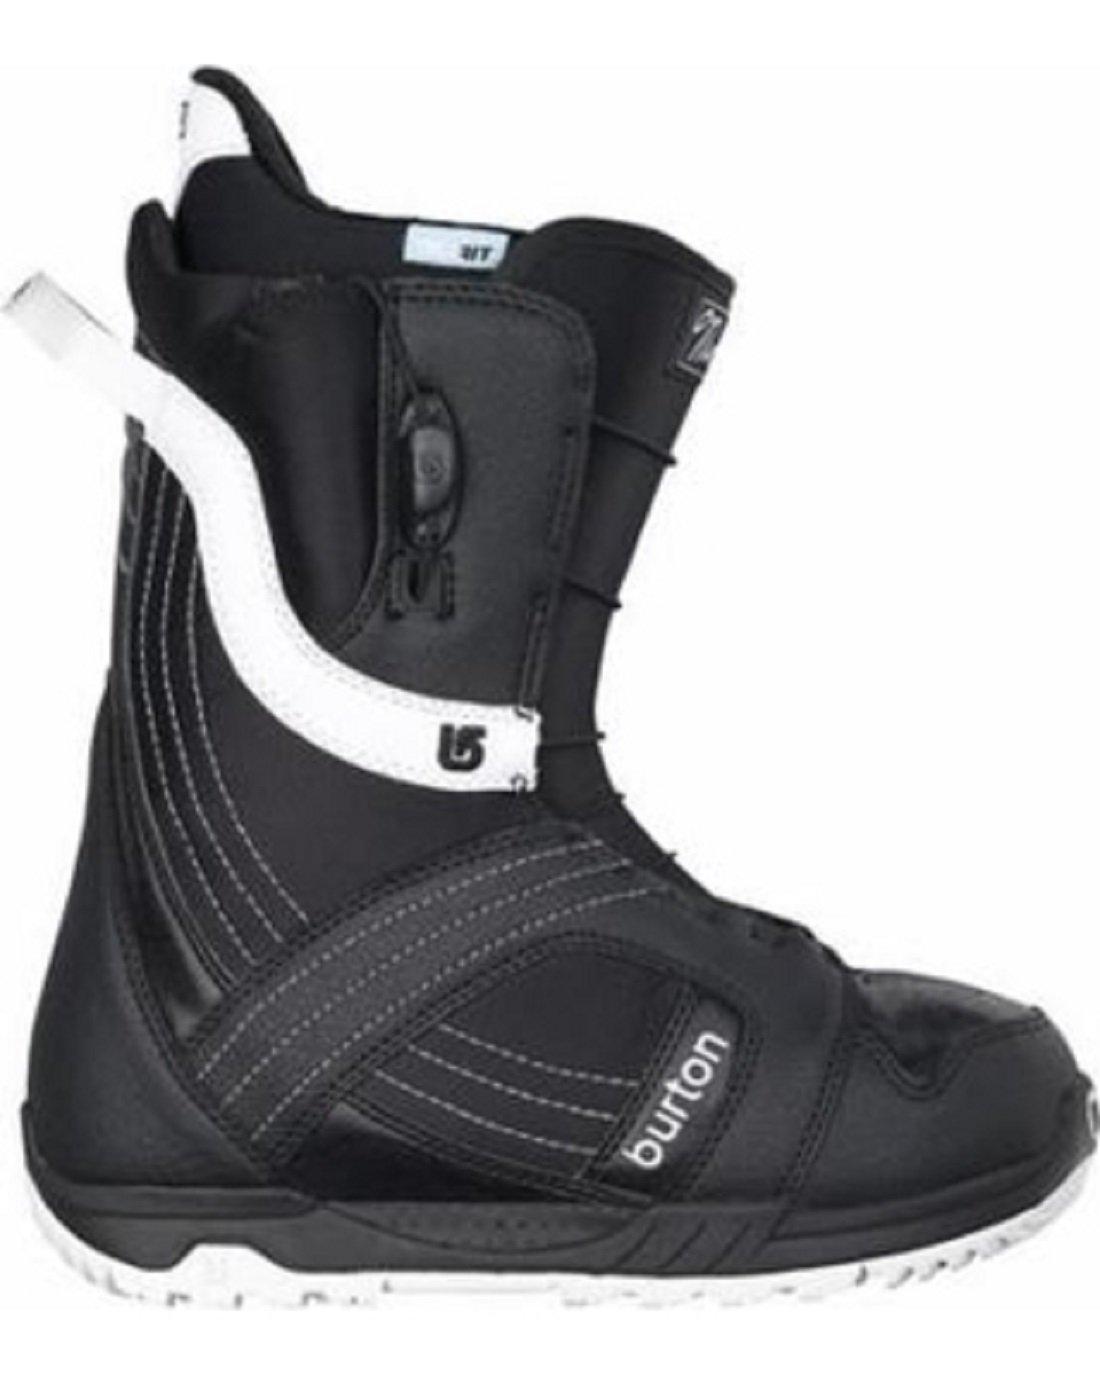 Burton Mint Snowboard Boot (Black/White, 6.0)